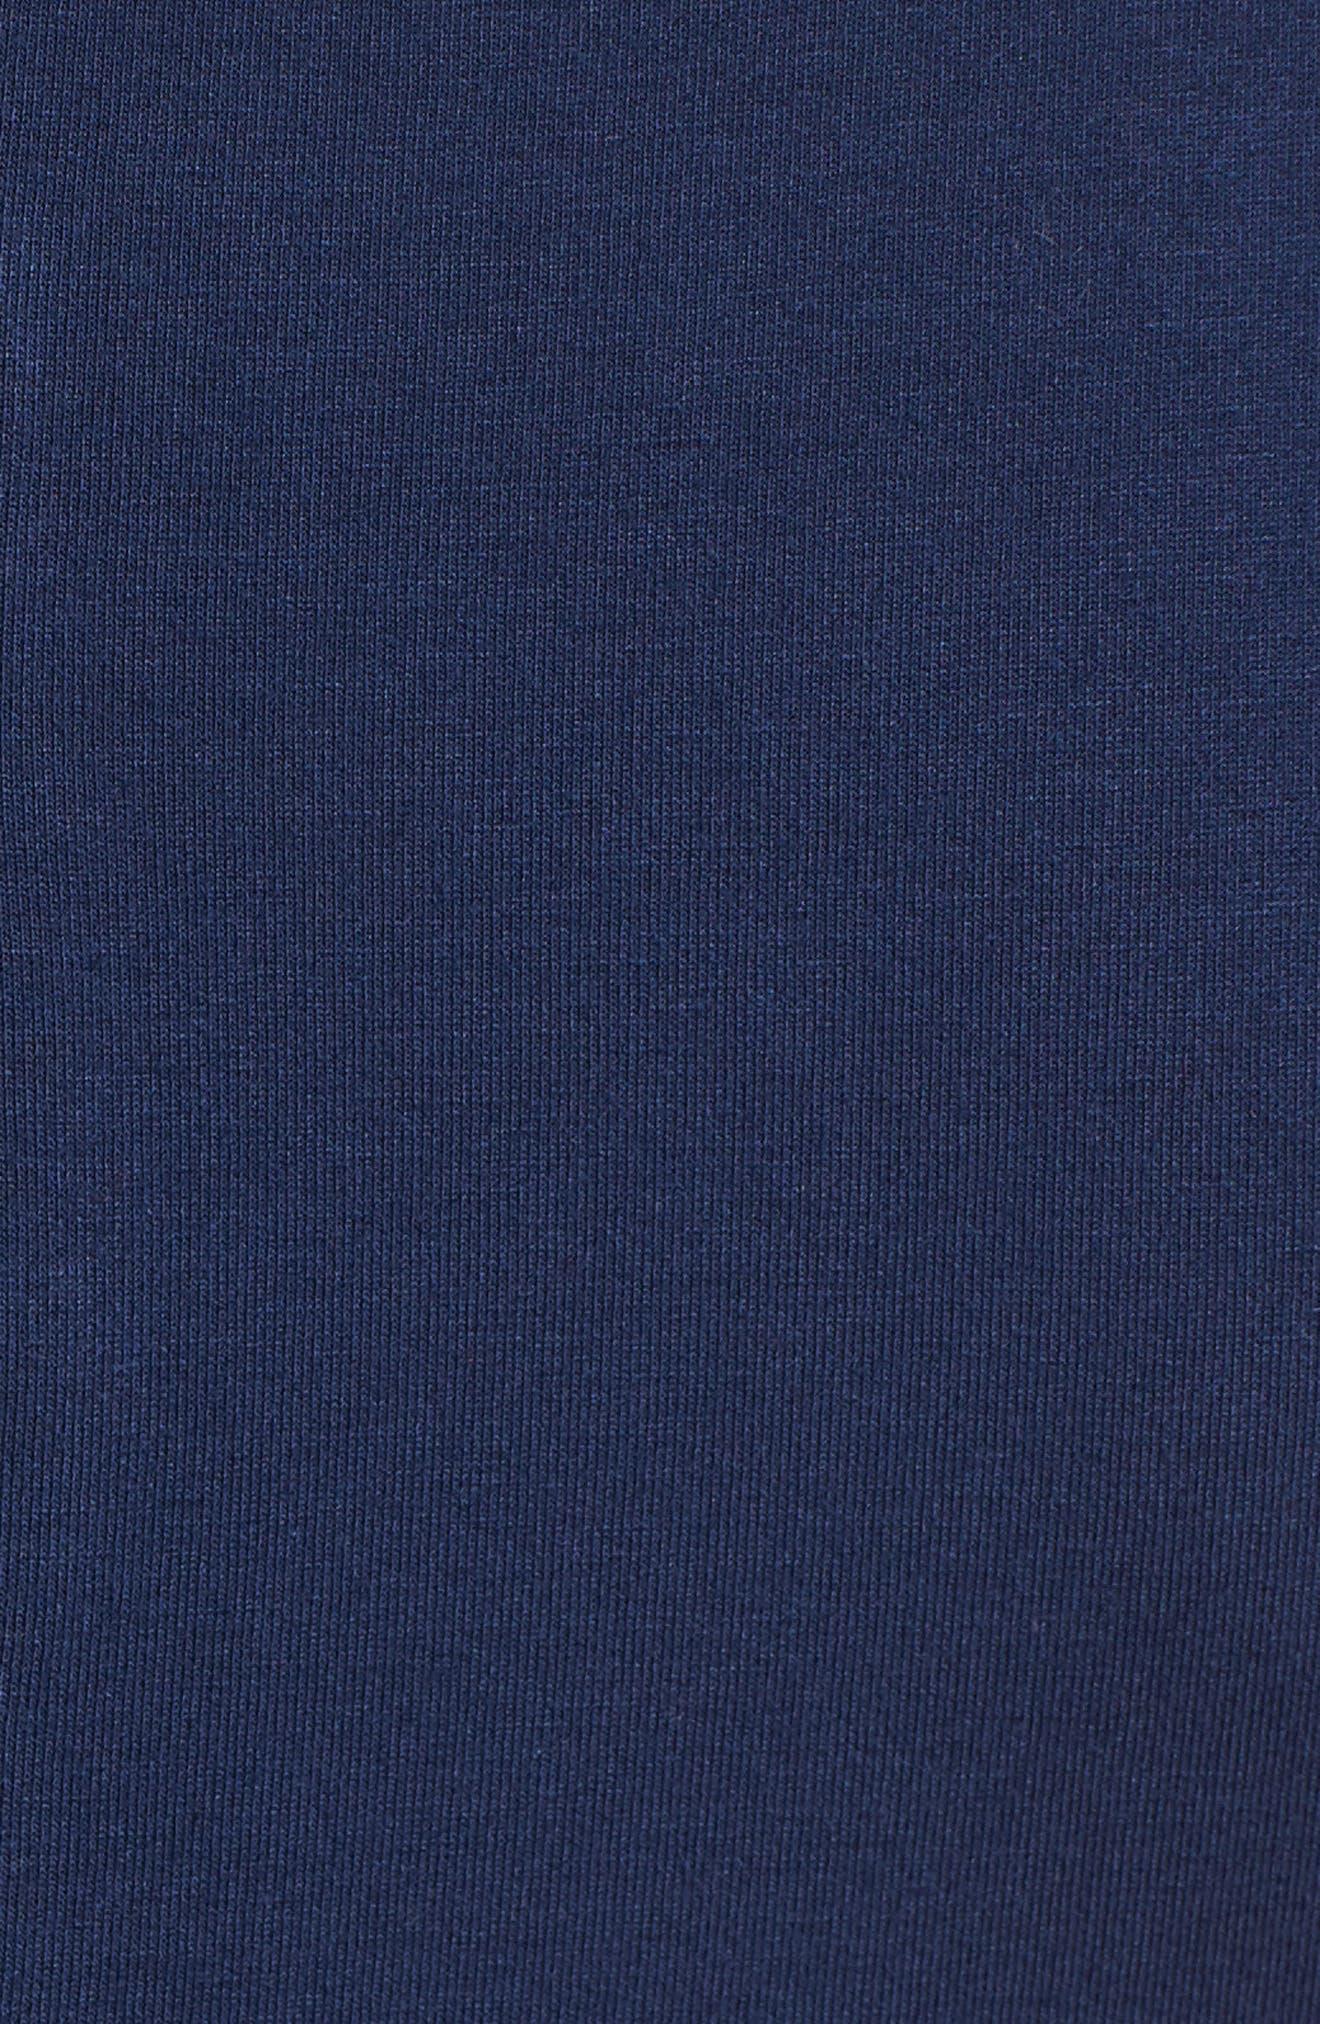 Chiffon Overlay Maxi Dress,                             Alternate thumbnail 6, color,                             HIGH TIDE